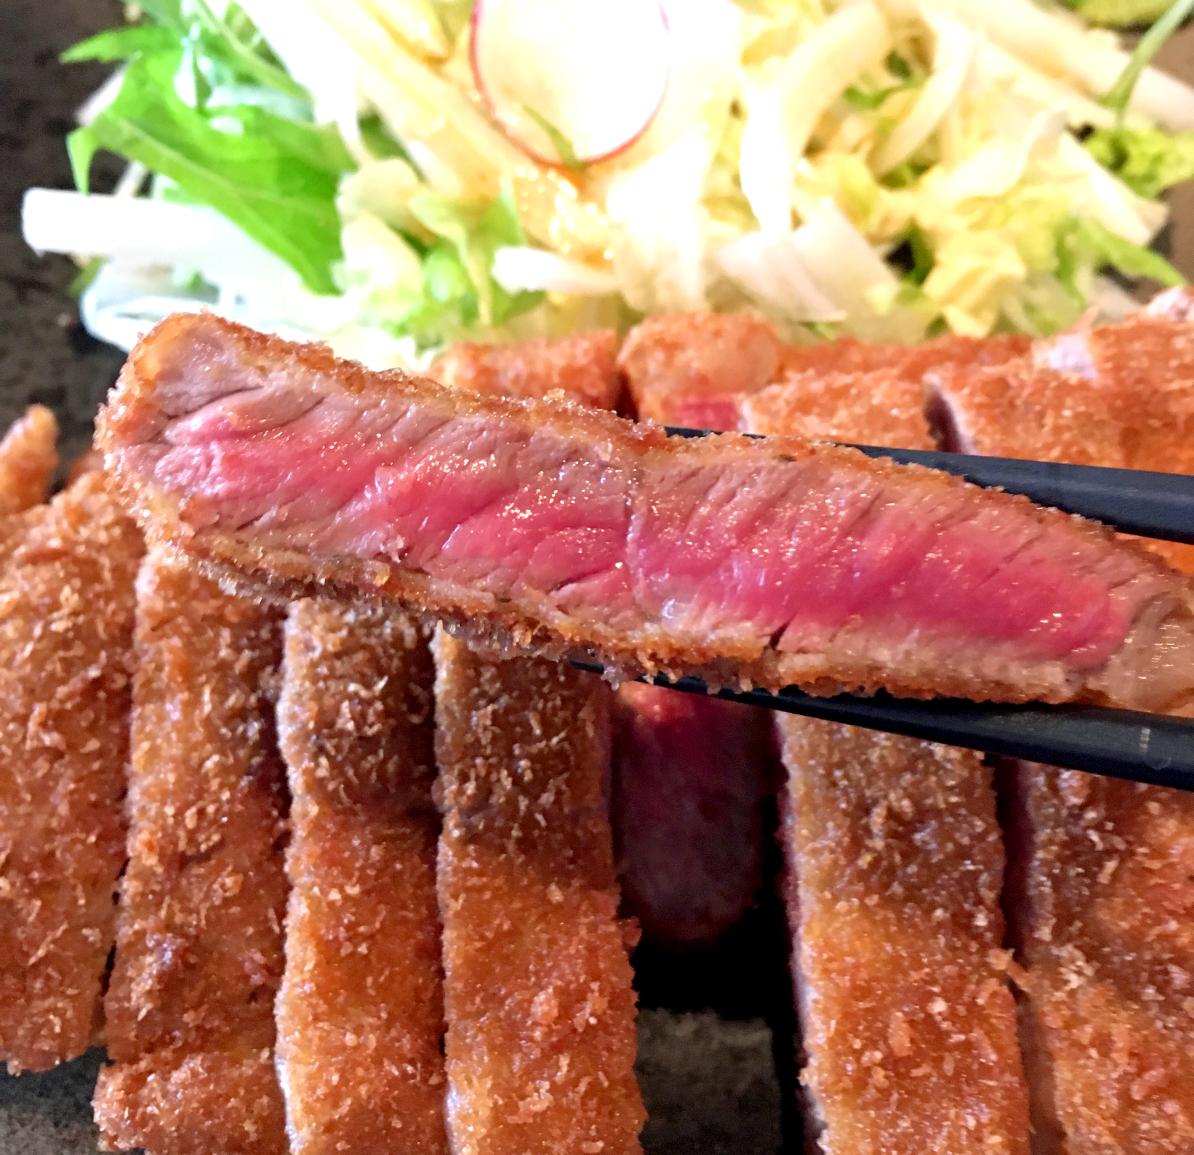 Cow and Miyaita to eat with wasabi sauce